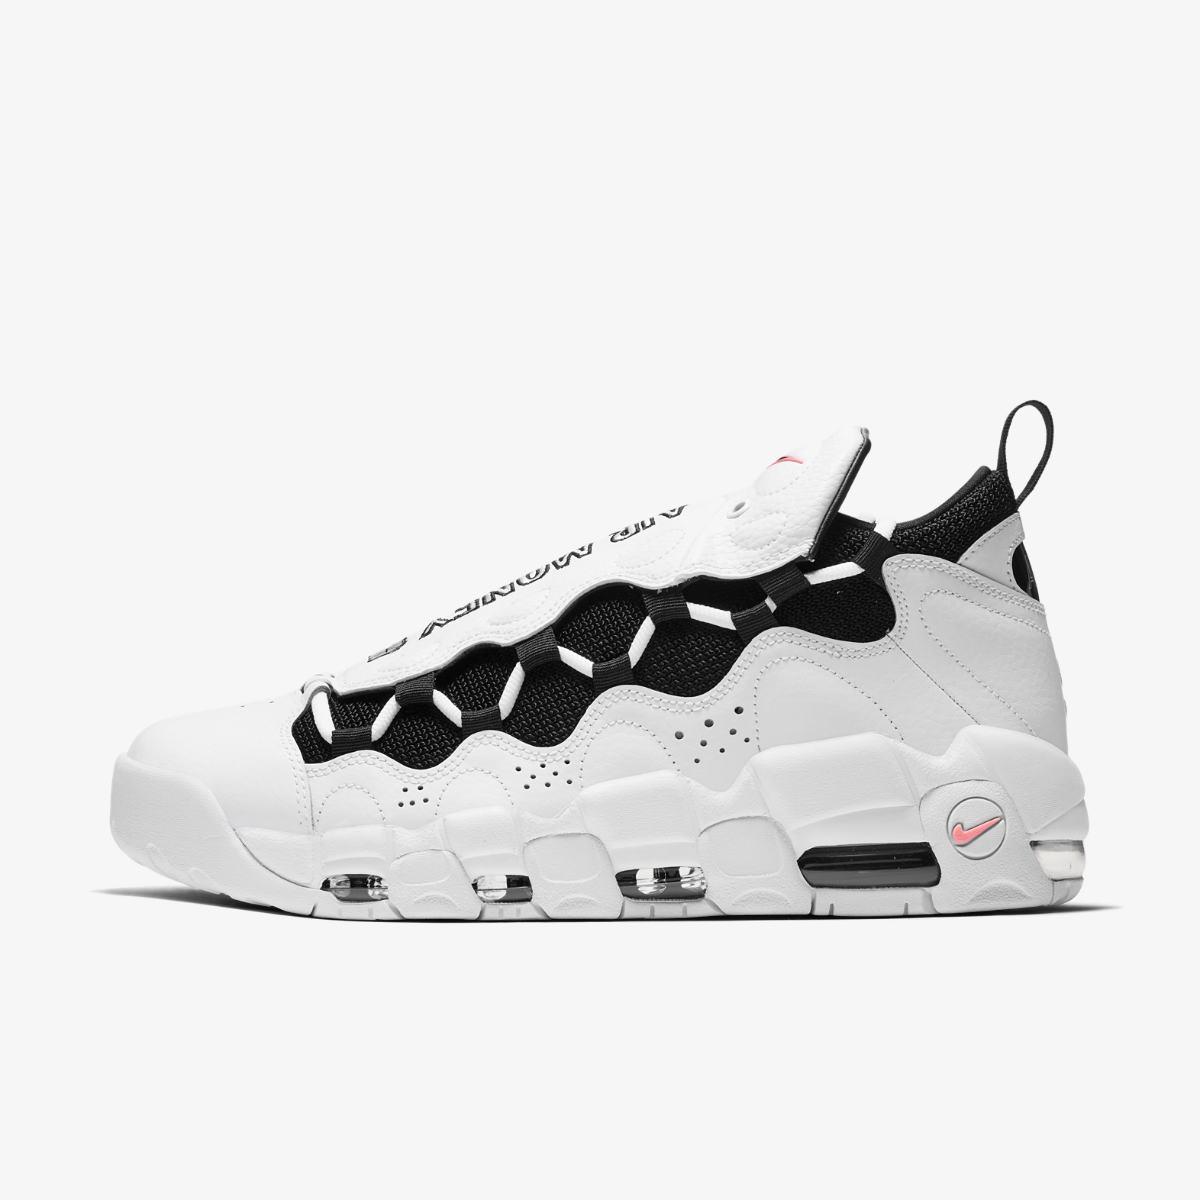 NIKE AIR MORE MONEY AJ2998 001 | Sneakers, Abbigliamento e